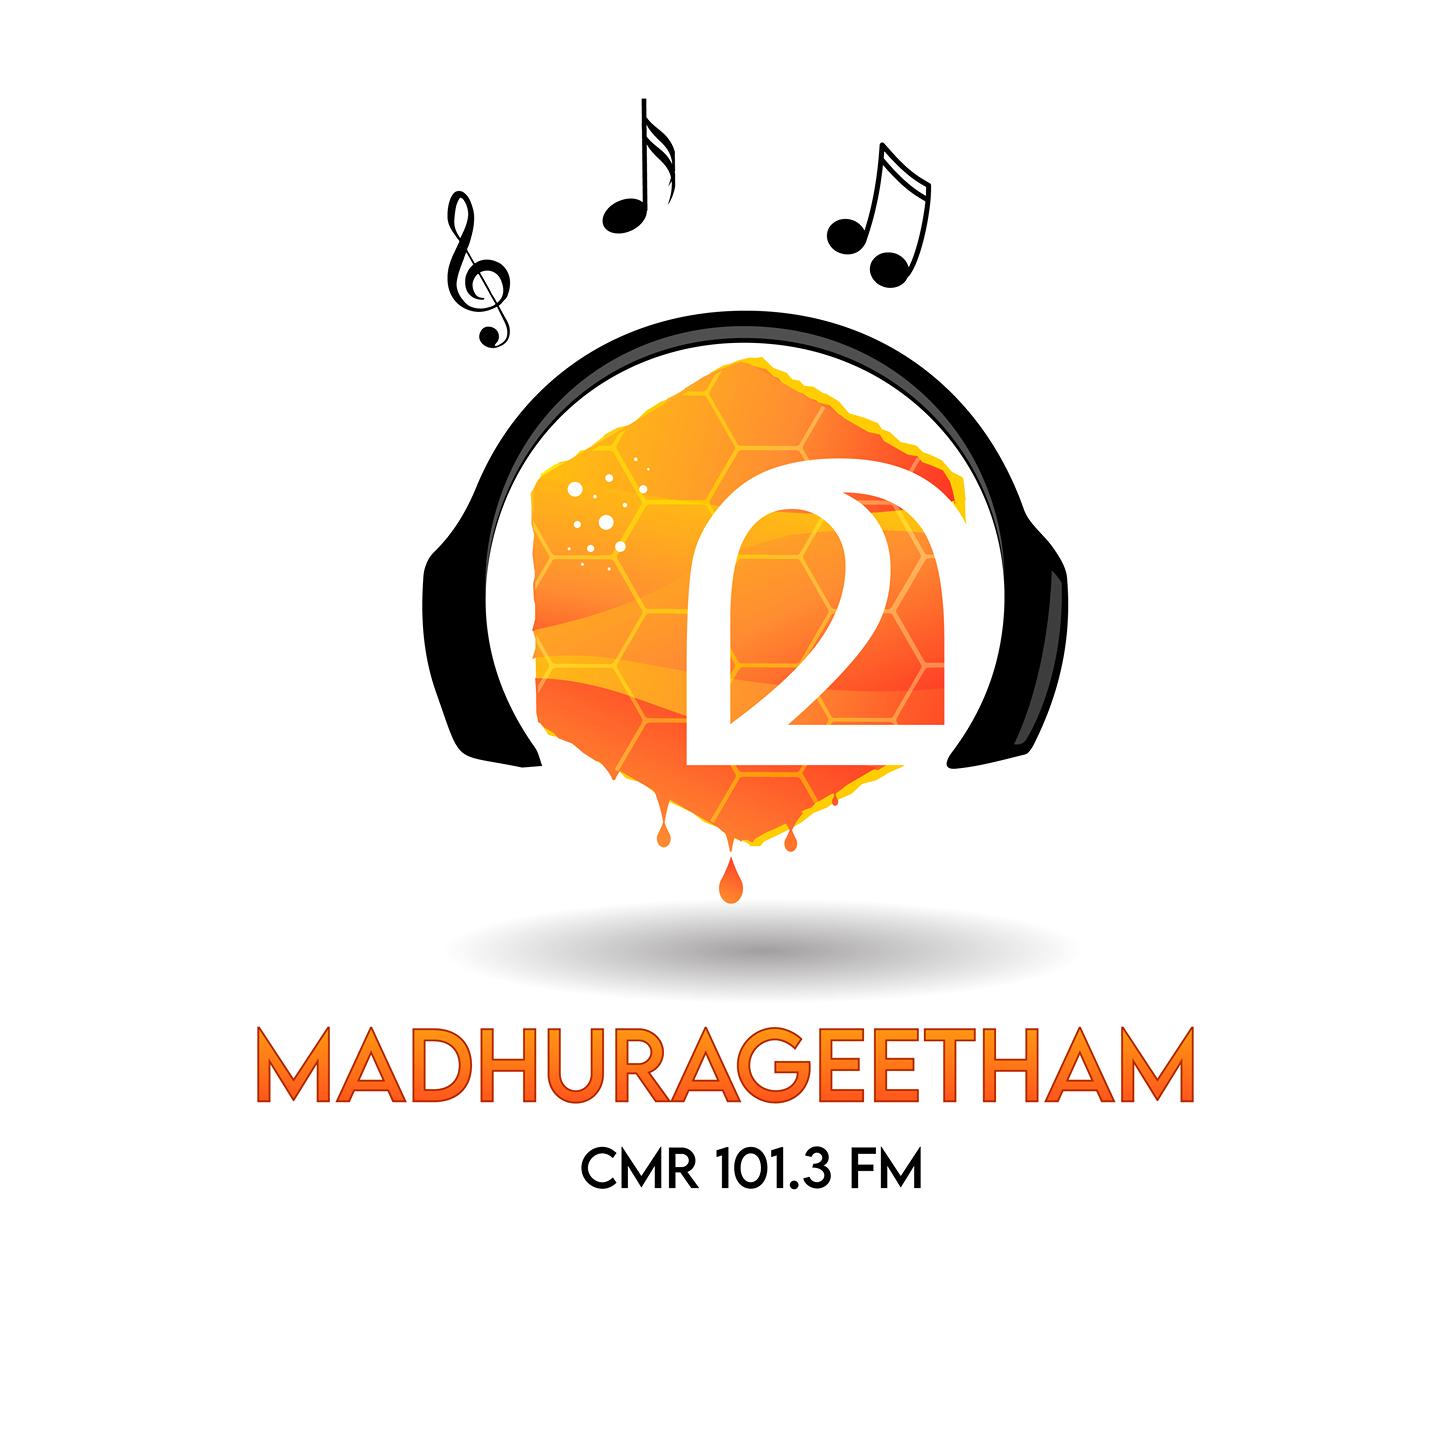 MadhuraGeetham CMR 101.3 FM – Toronto's Malayali FM Radio